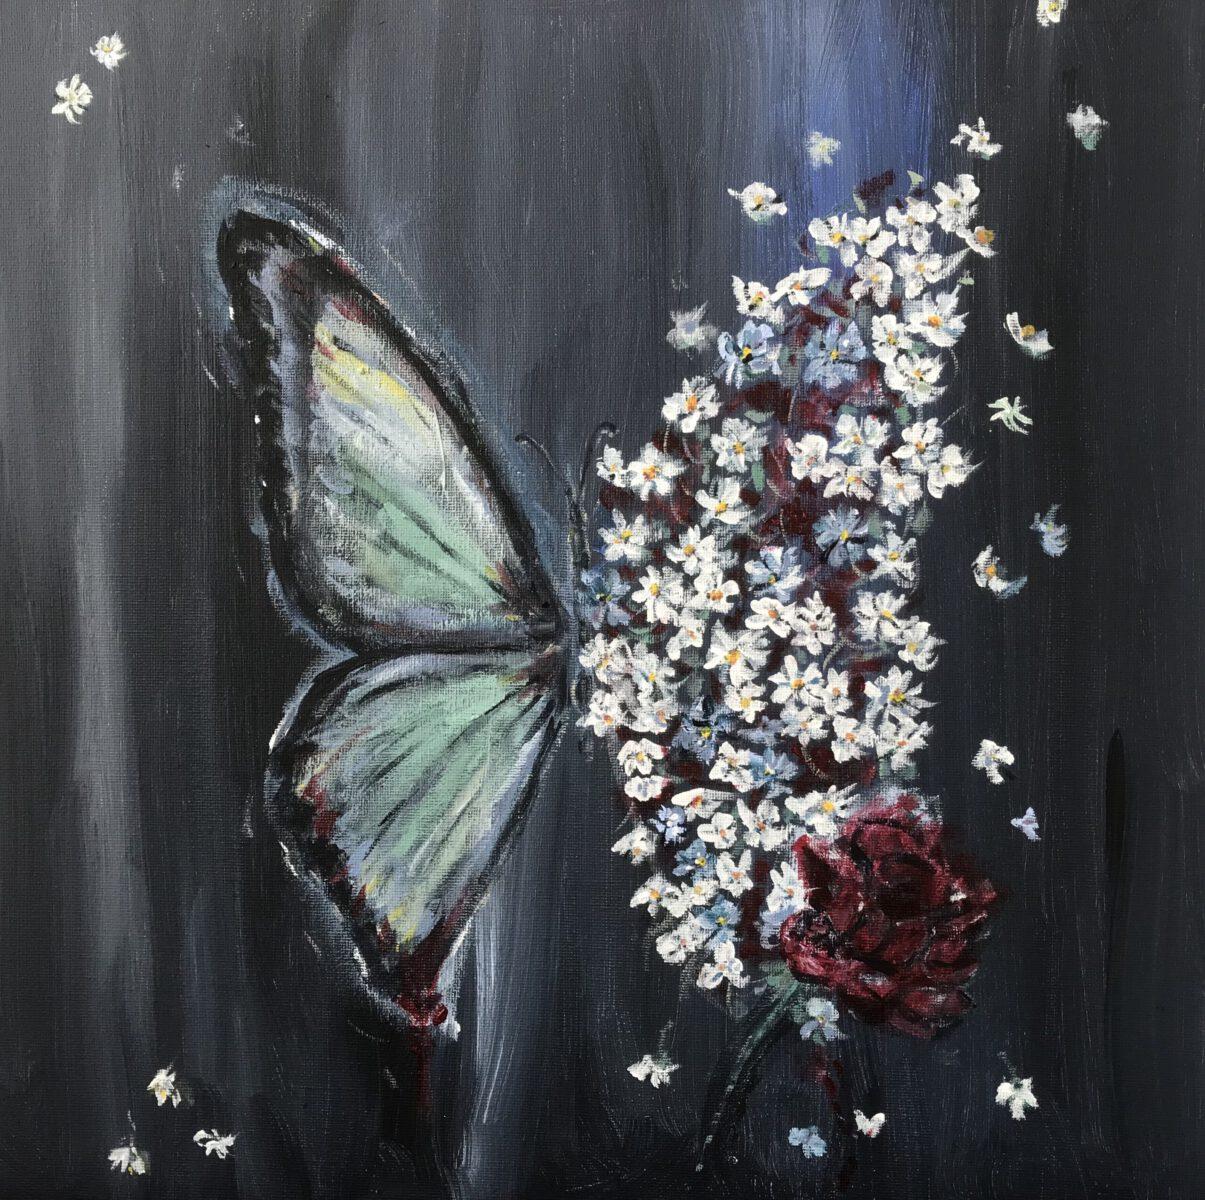 Saskia Stapel painting butterfly vlinder flowers bloemen phase